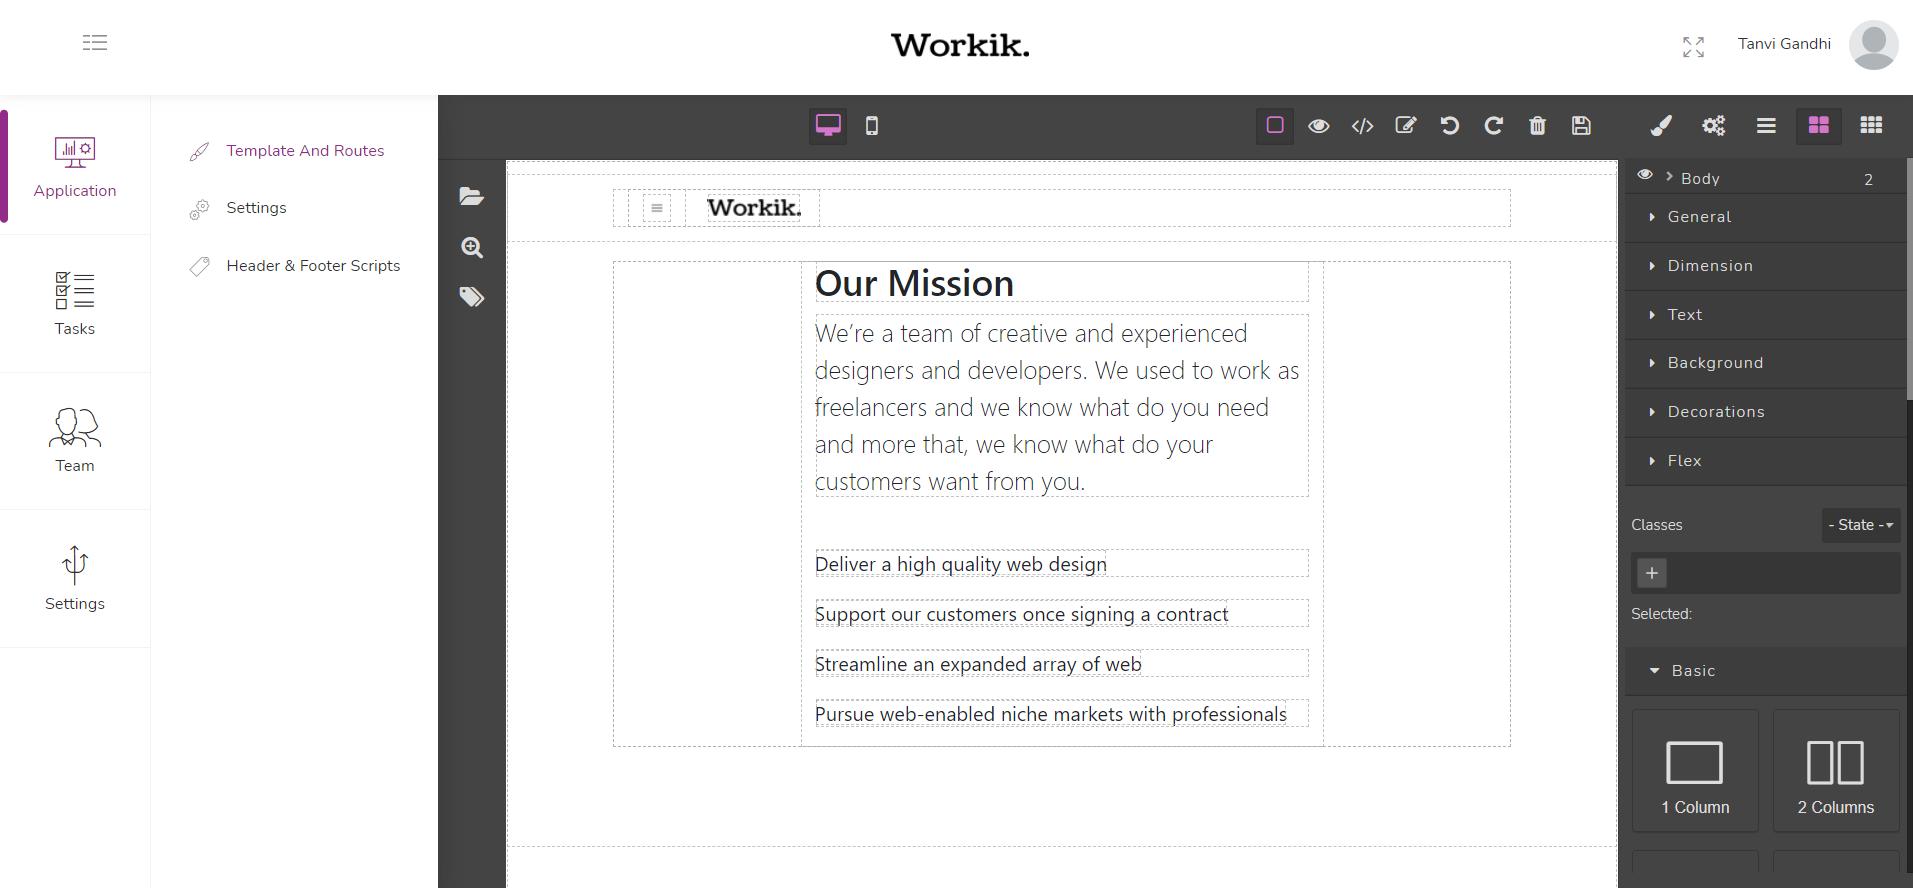 Workik Software - 2